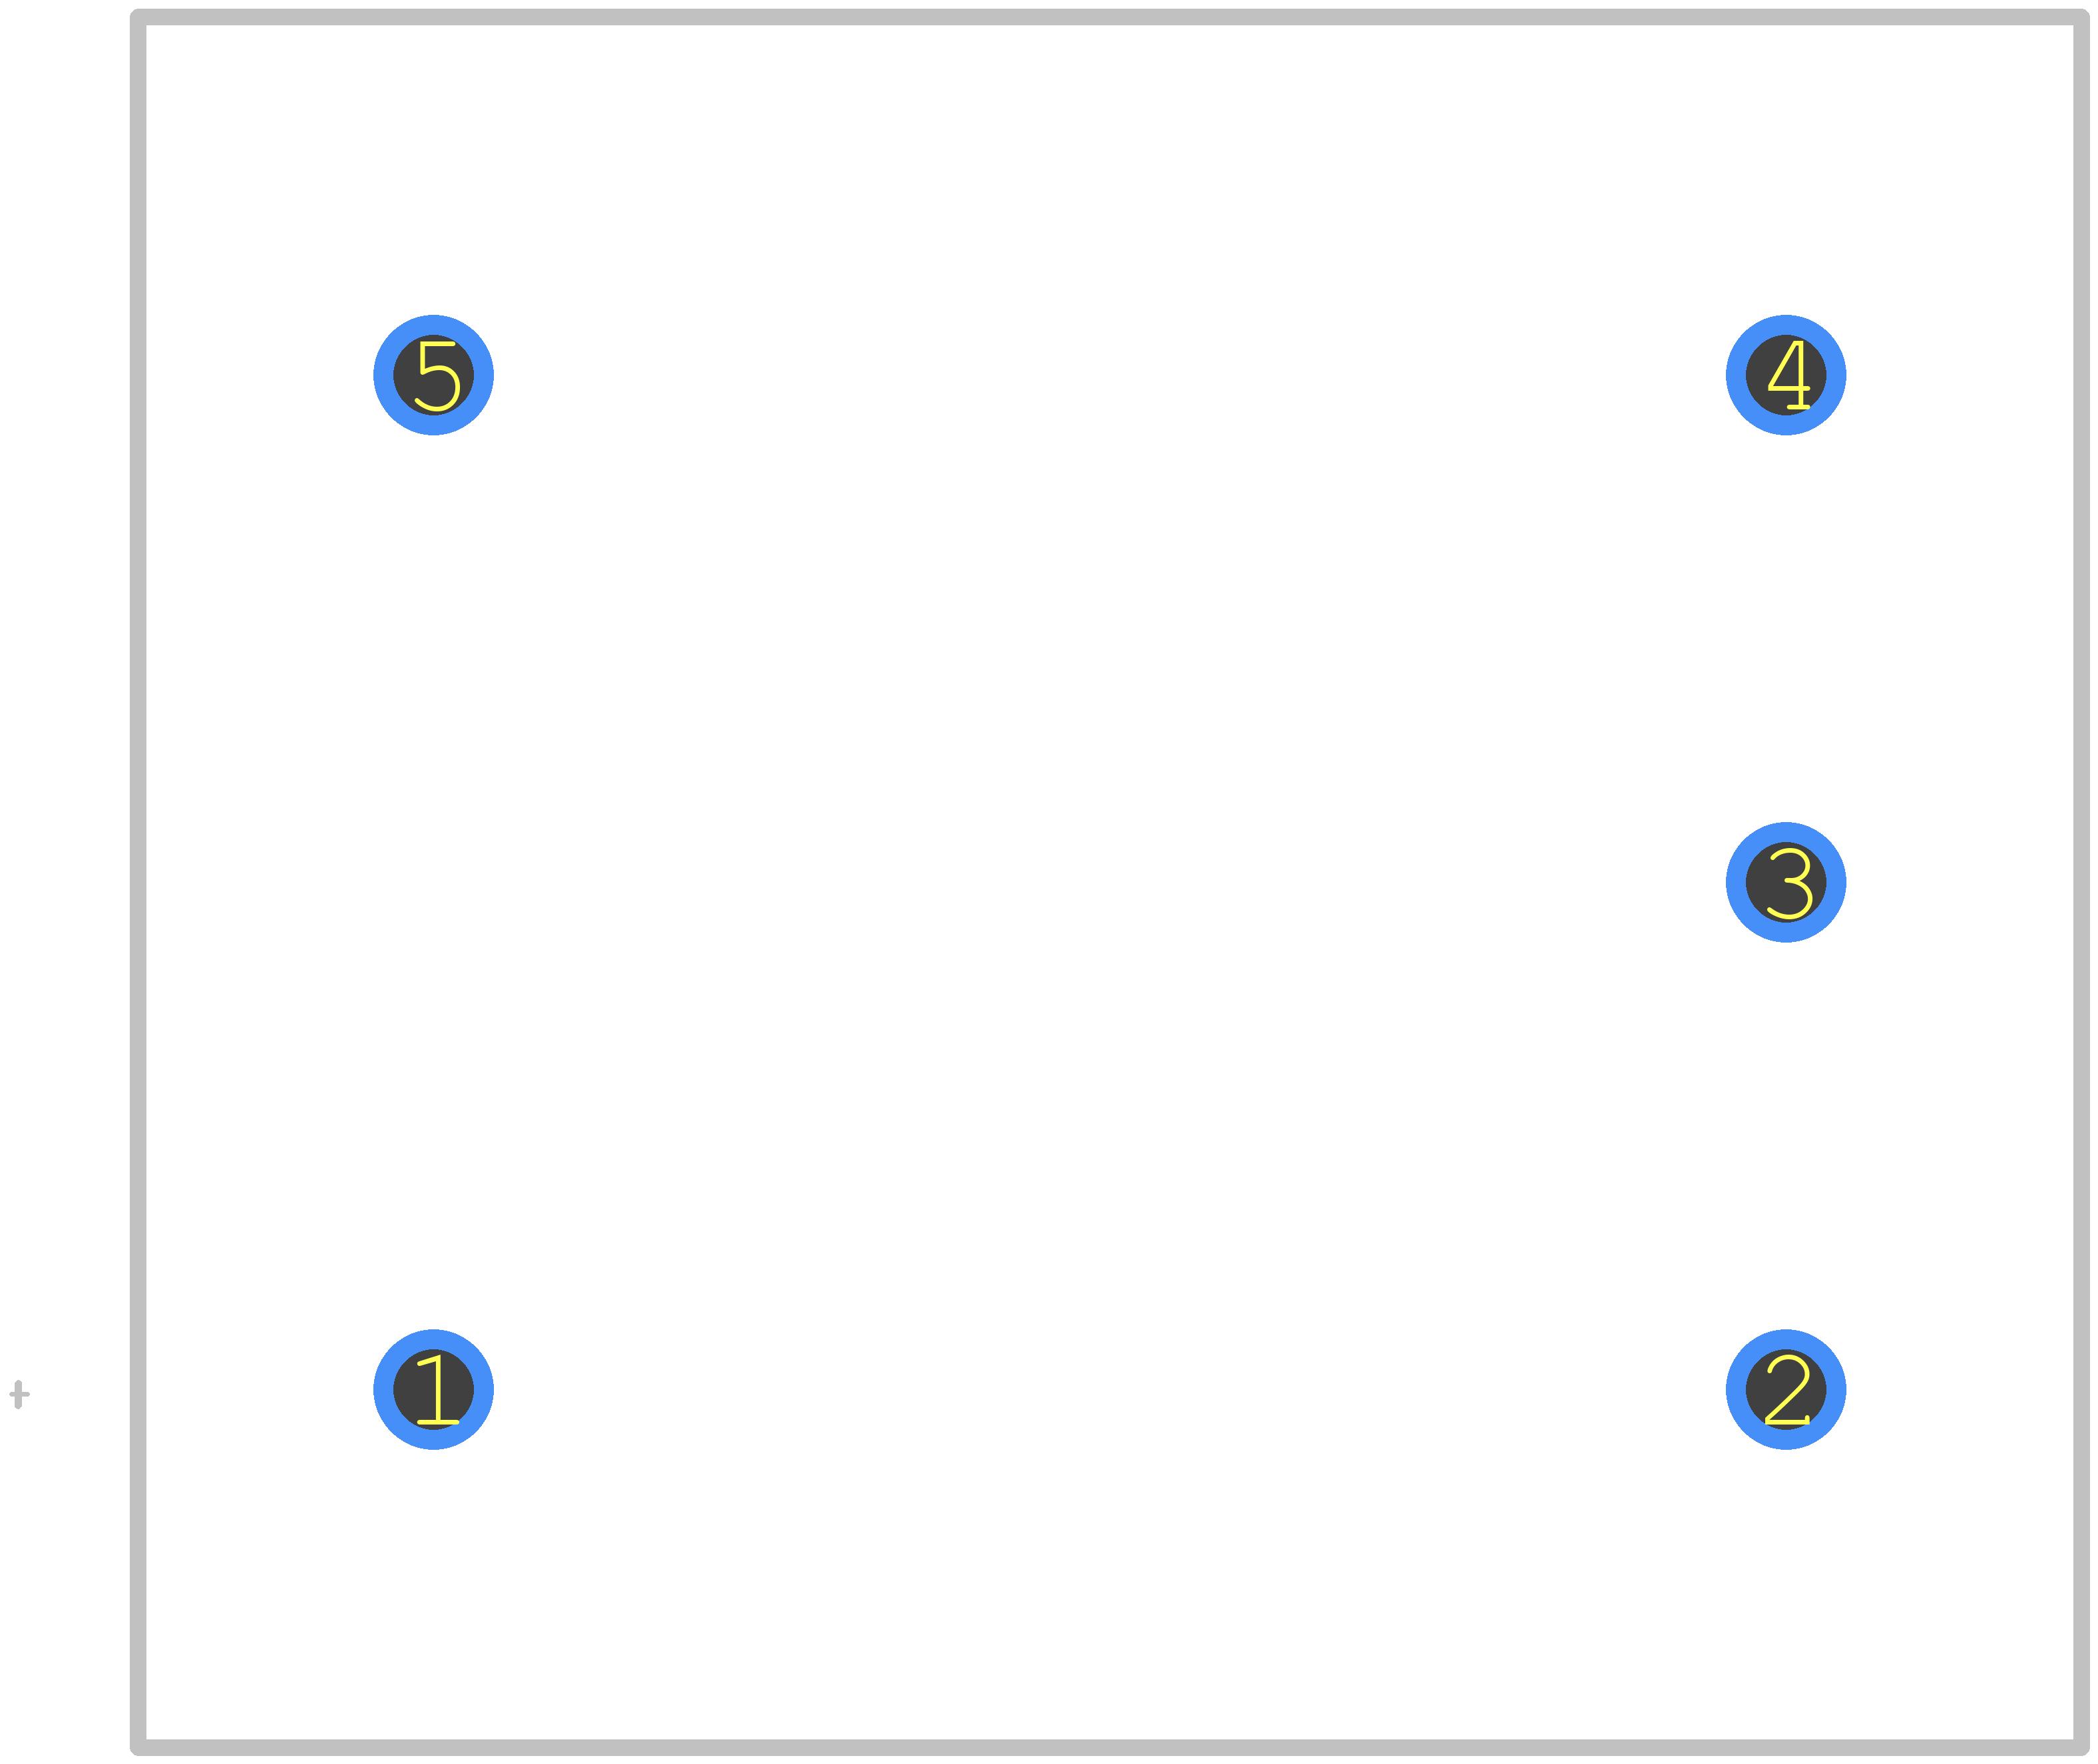 LV 25-P - LEM PCB footprint - Other - LV-25-P